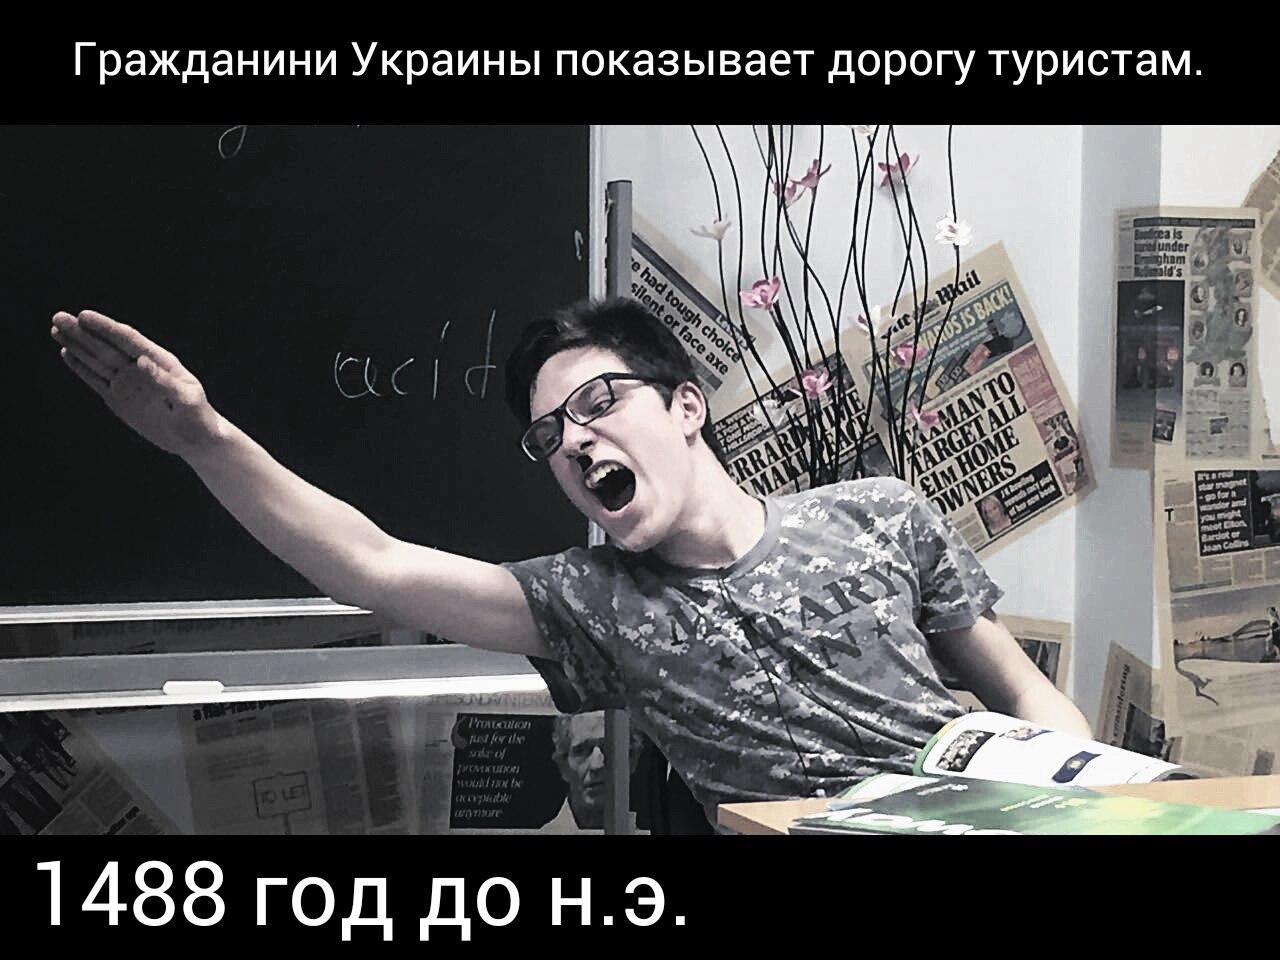 https://pp.userapi.com/c638520/v638520588/42a1e/BcyA7xgJ5Rc.jpg